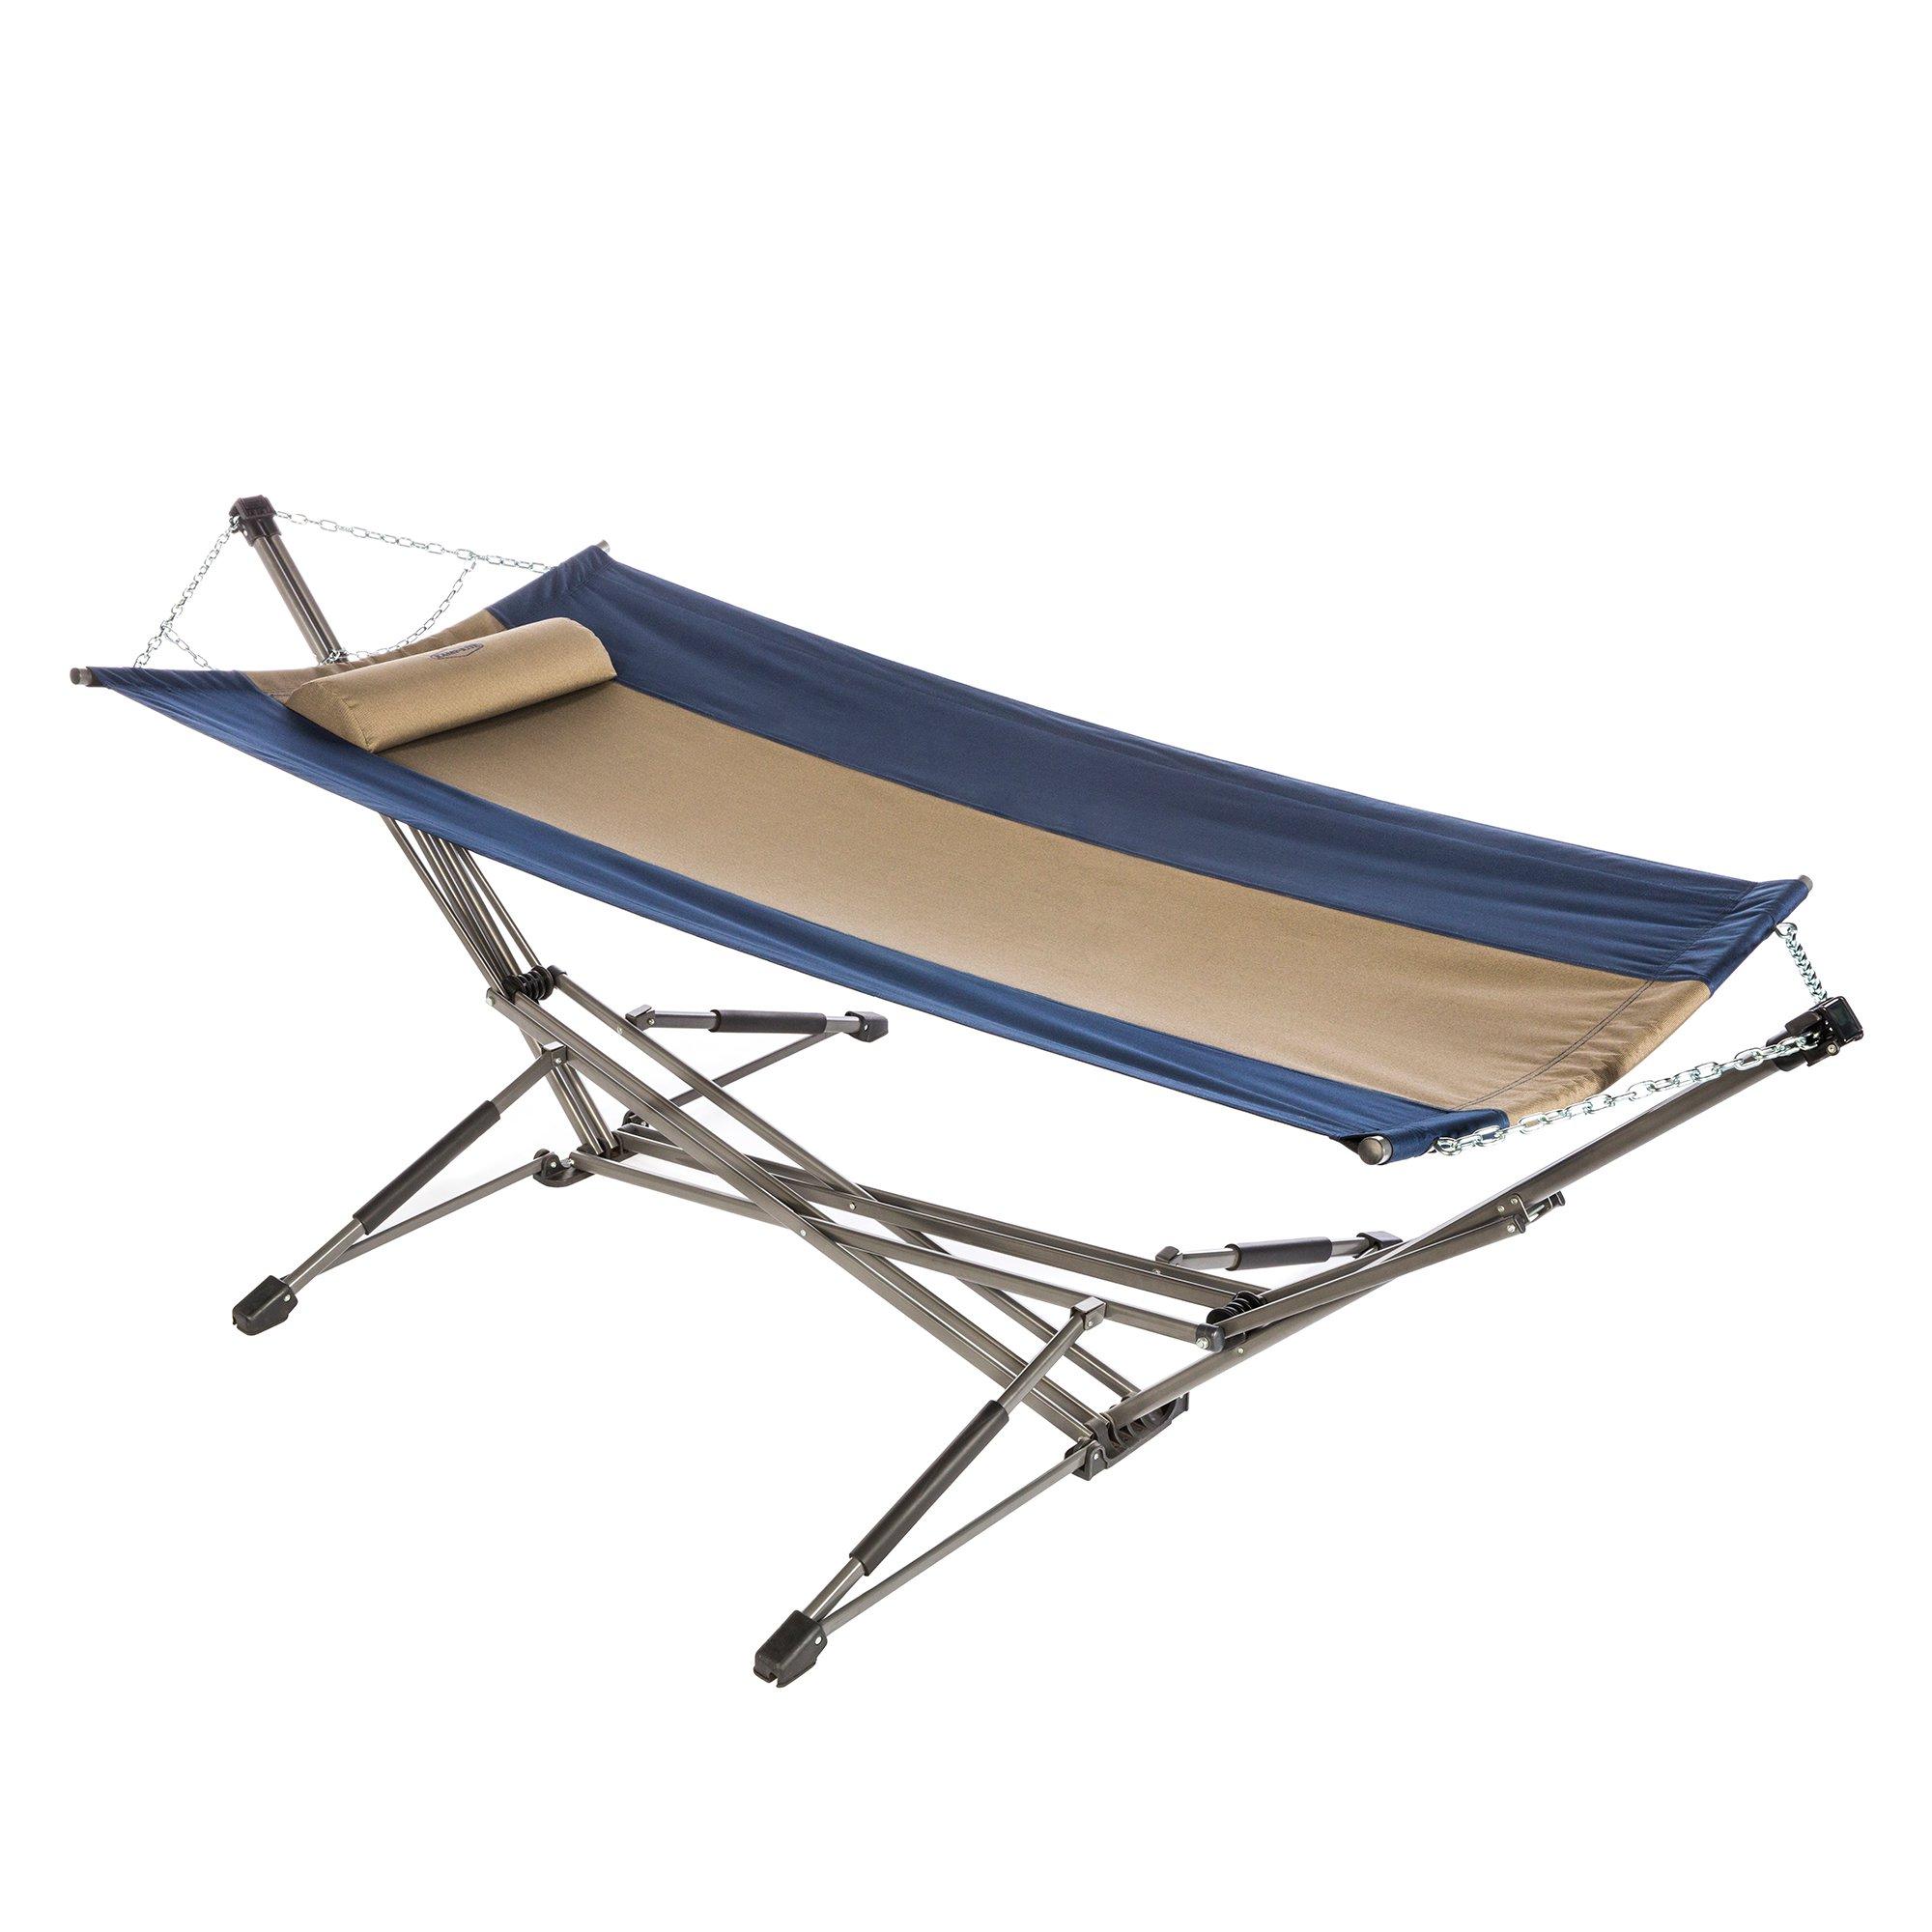 Kamp Rite Indoor Outdoor Camping Kwik Set Portable Collapsible Hammock w/ Stand